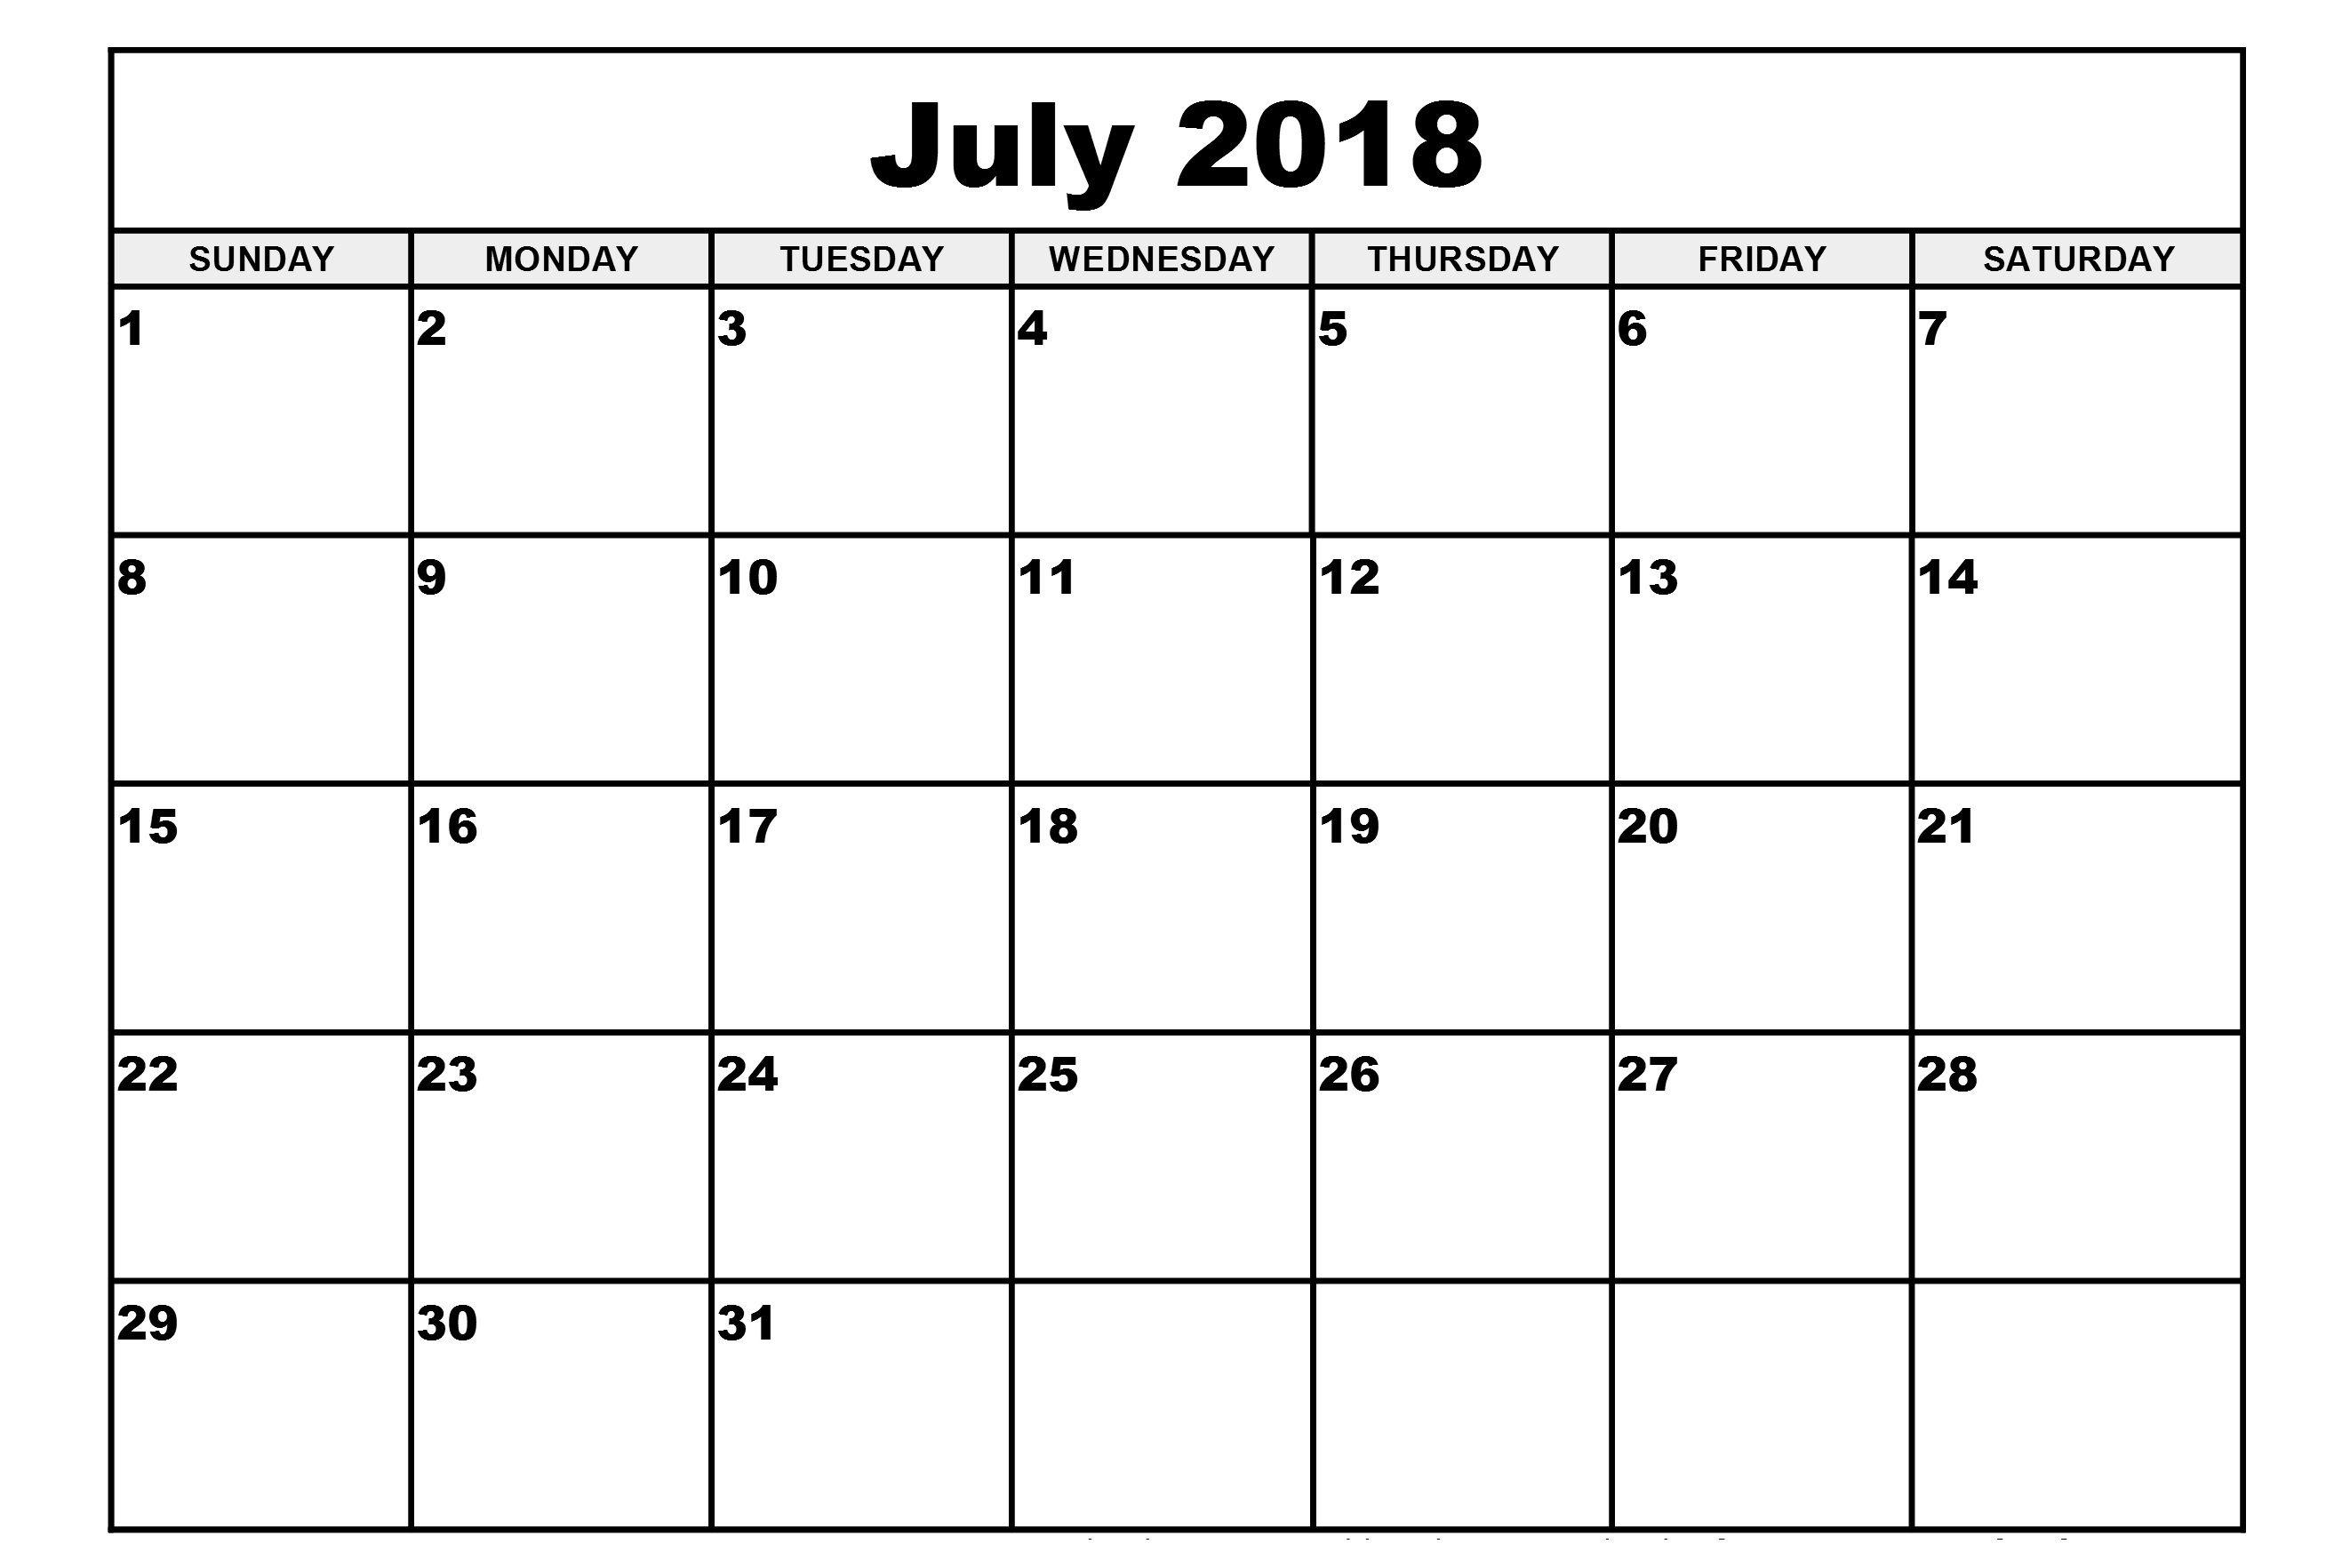 Decorative July 2018 Calendar, July 2018 Calendar Pdf, Word